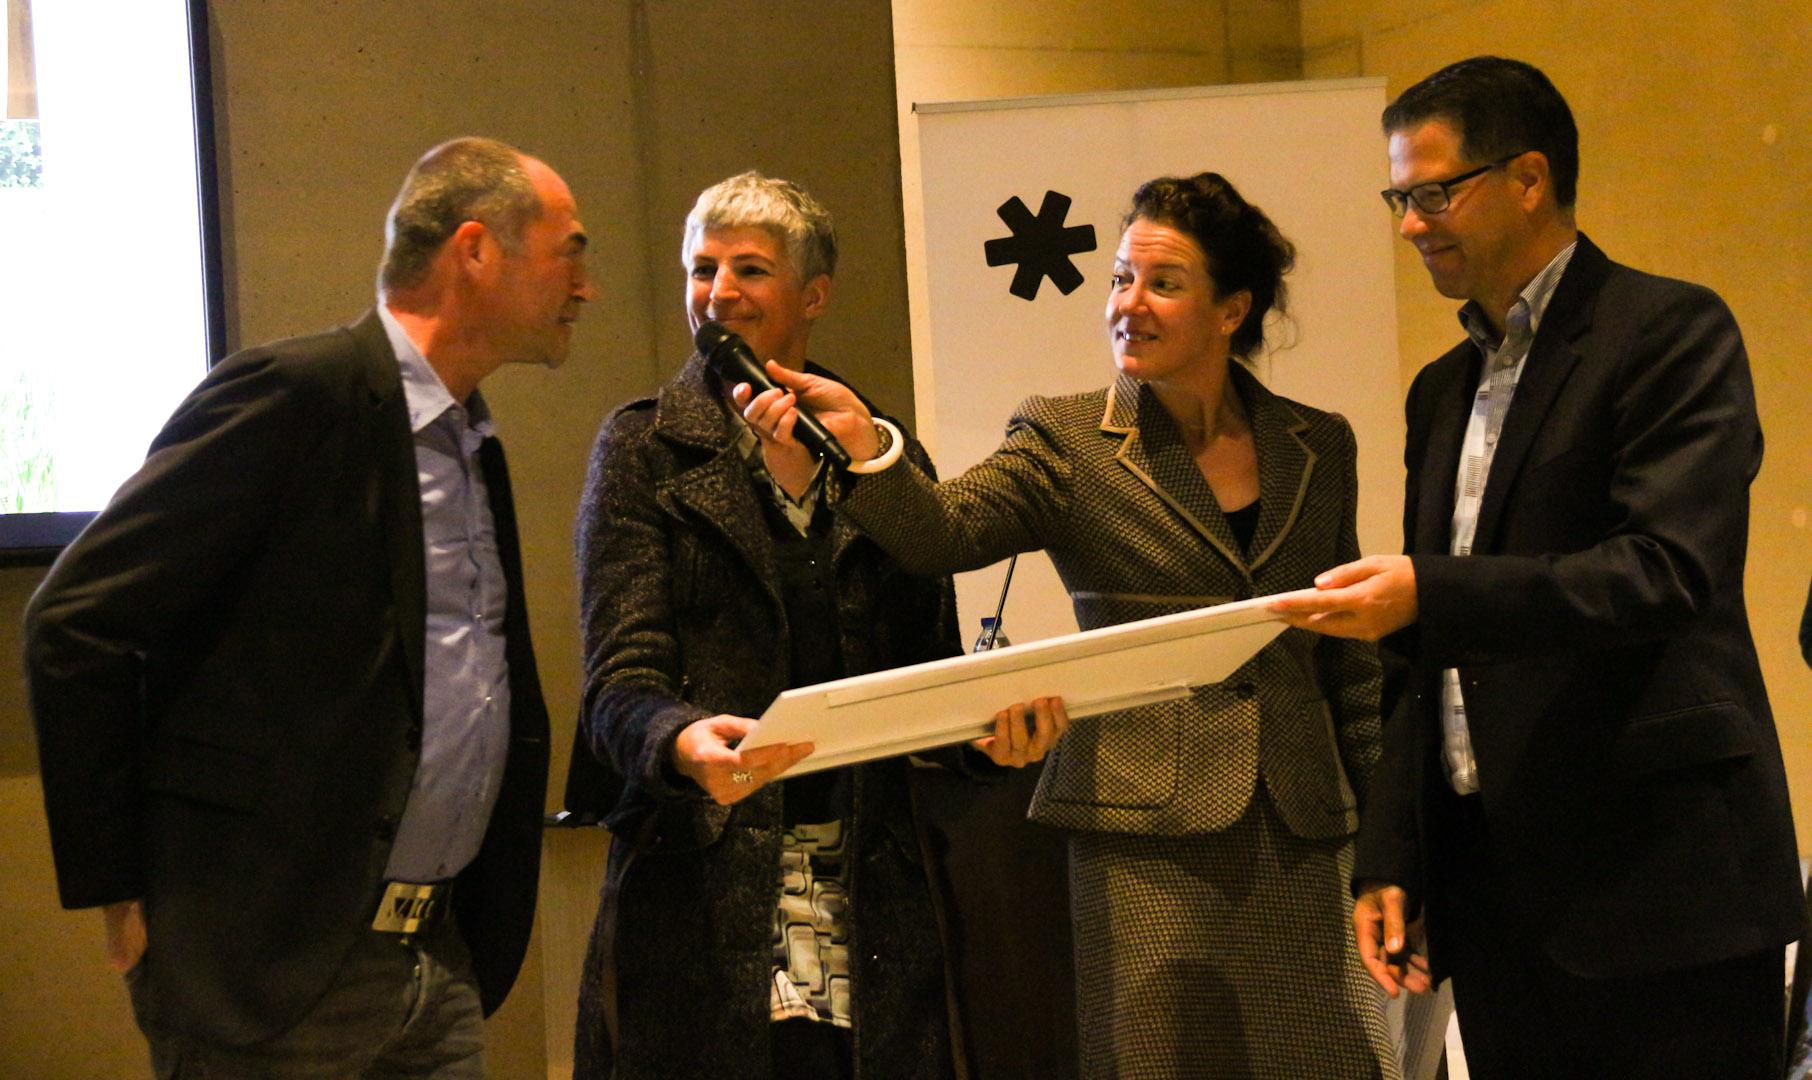 TEEMA 07 106 AGILON nominatie architectuurprijs provincie Vlaams-Brabant